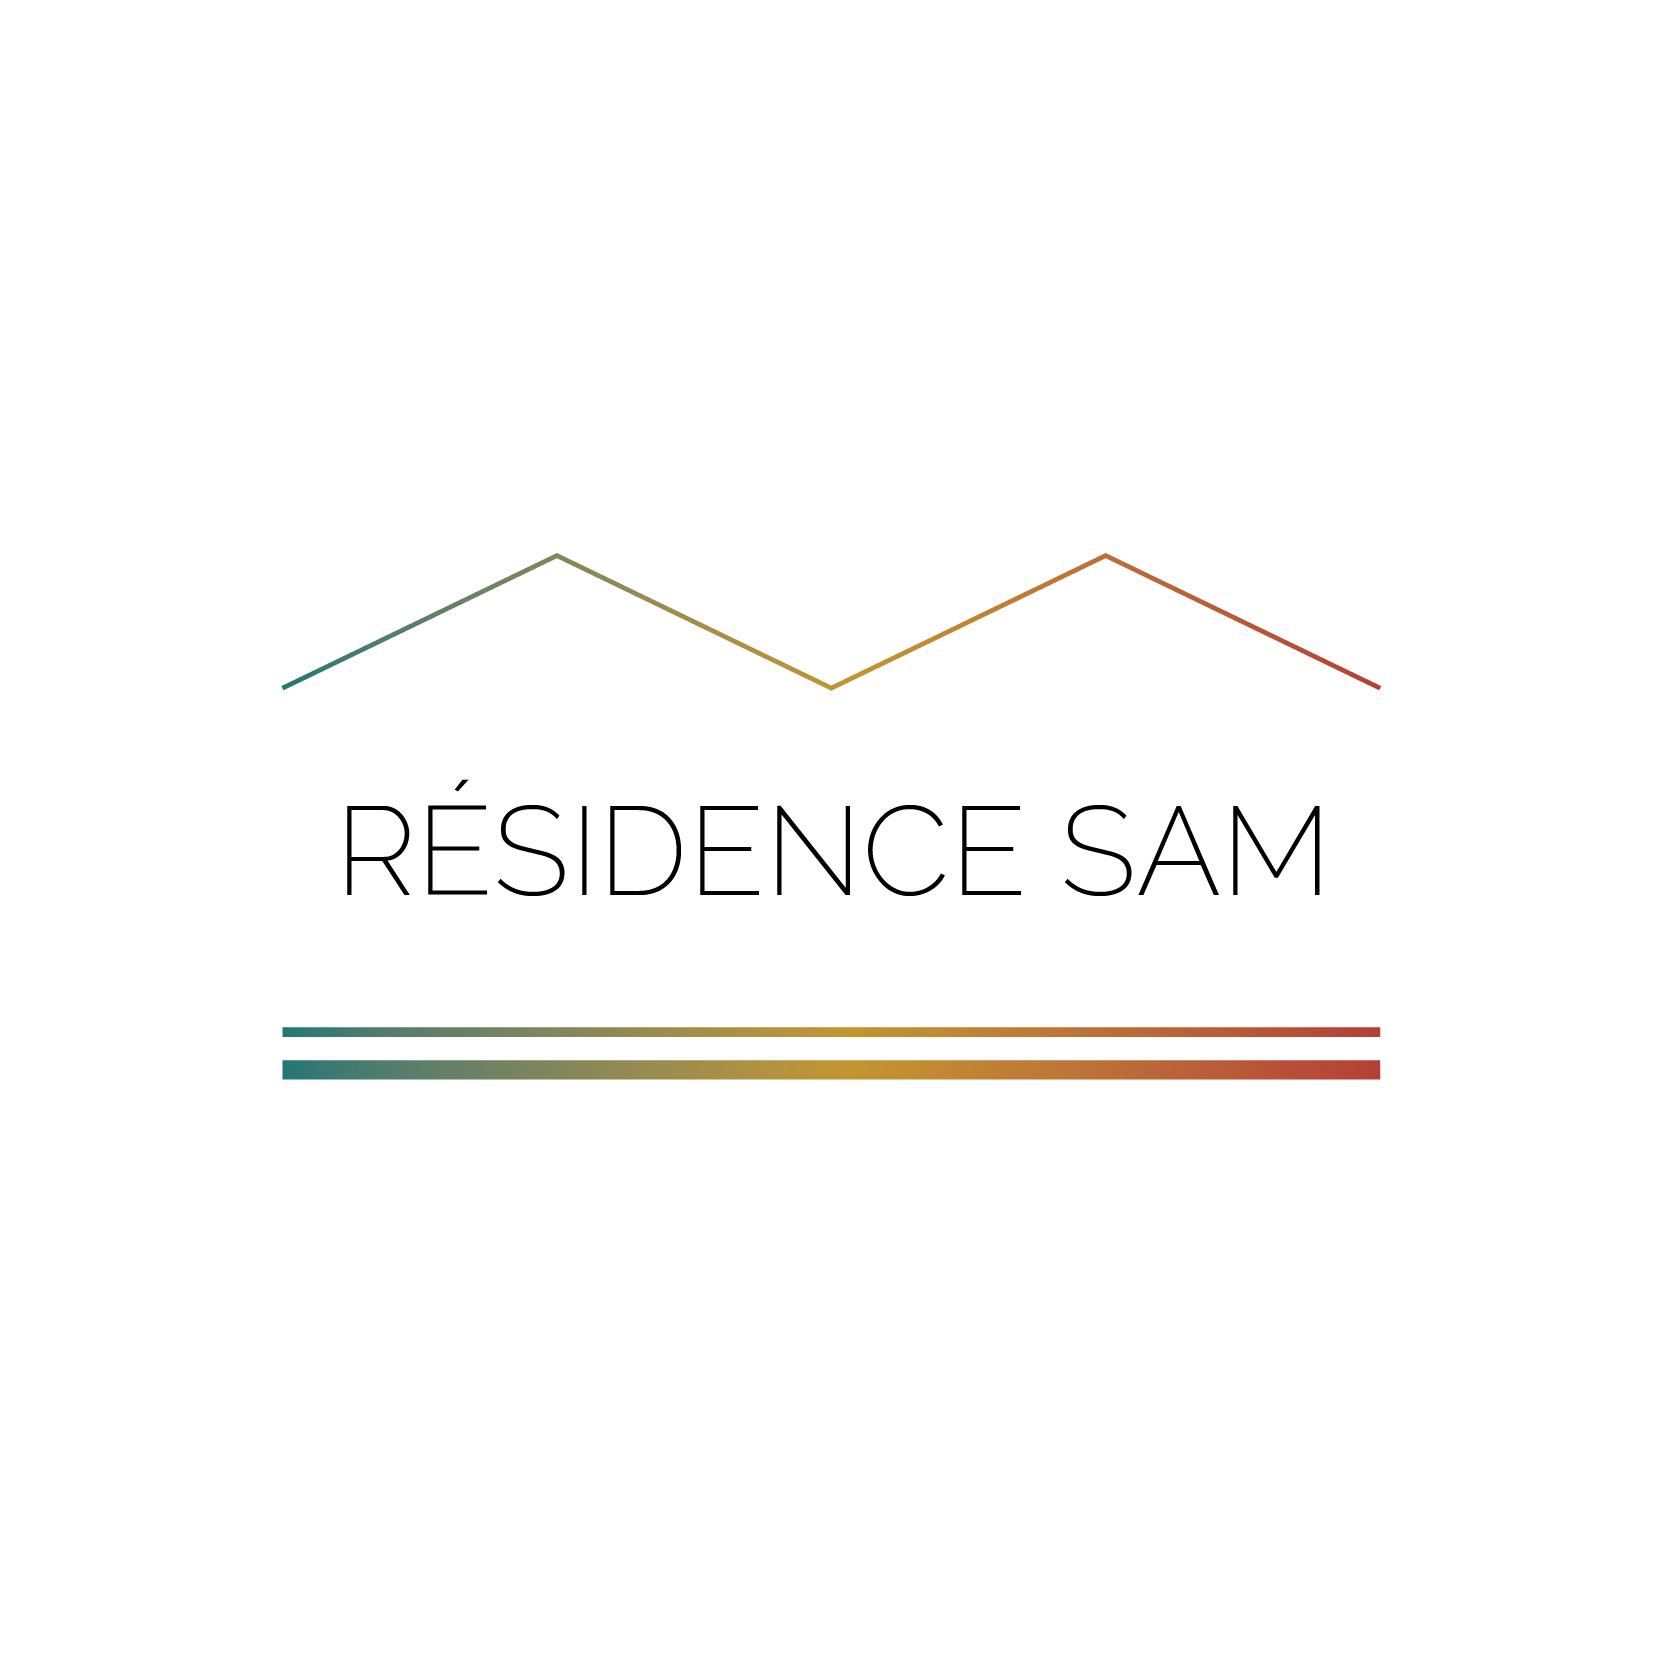 SAM 2015 RESIDENTS